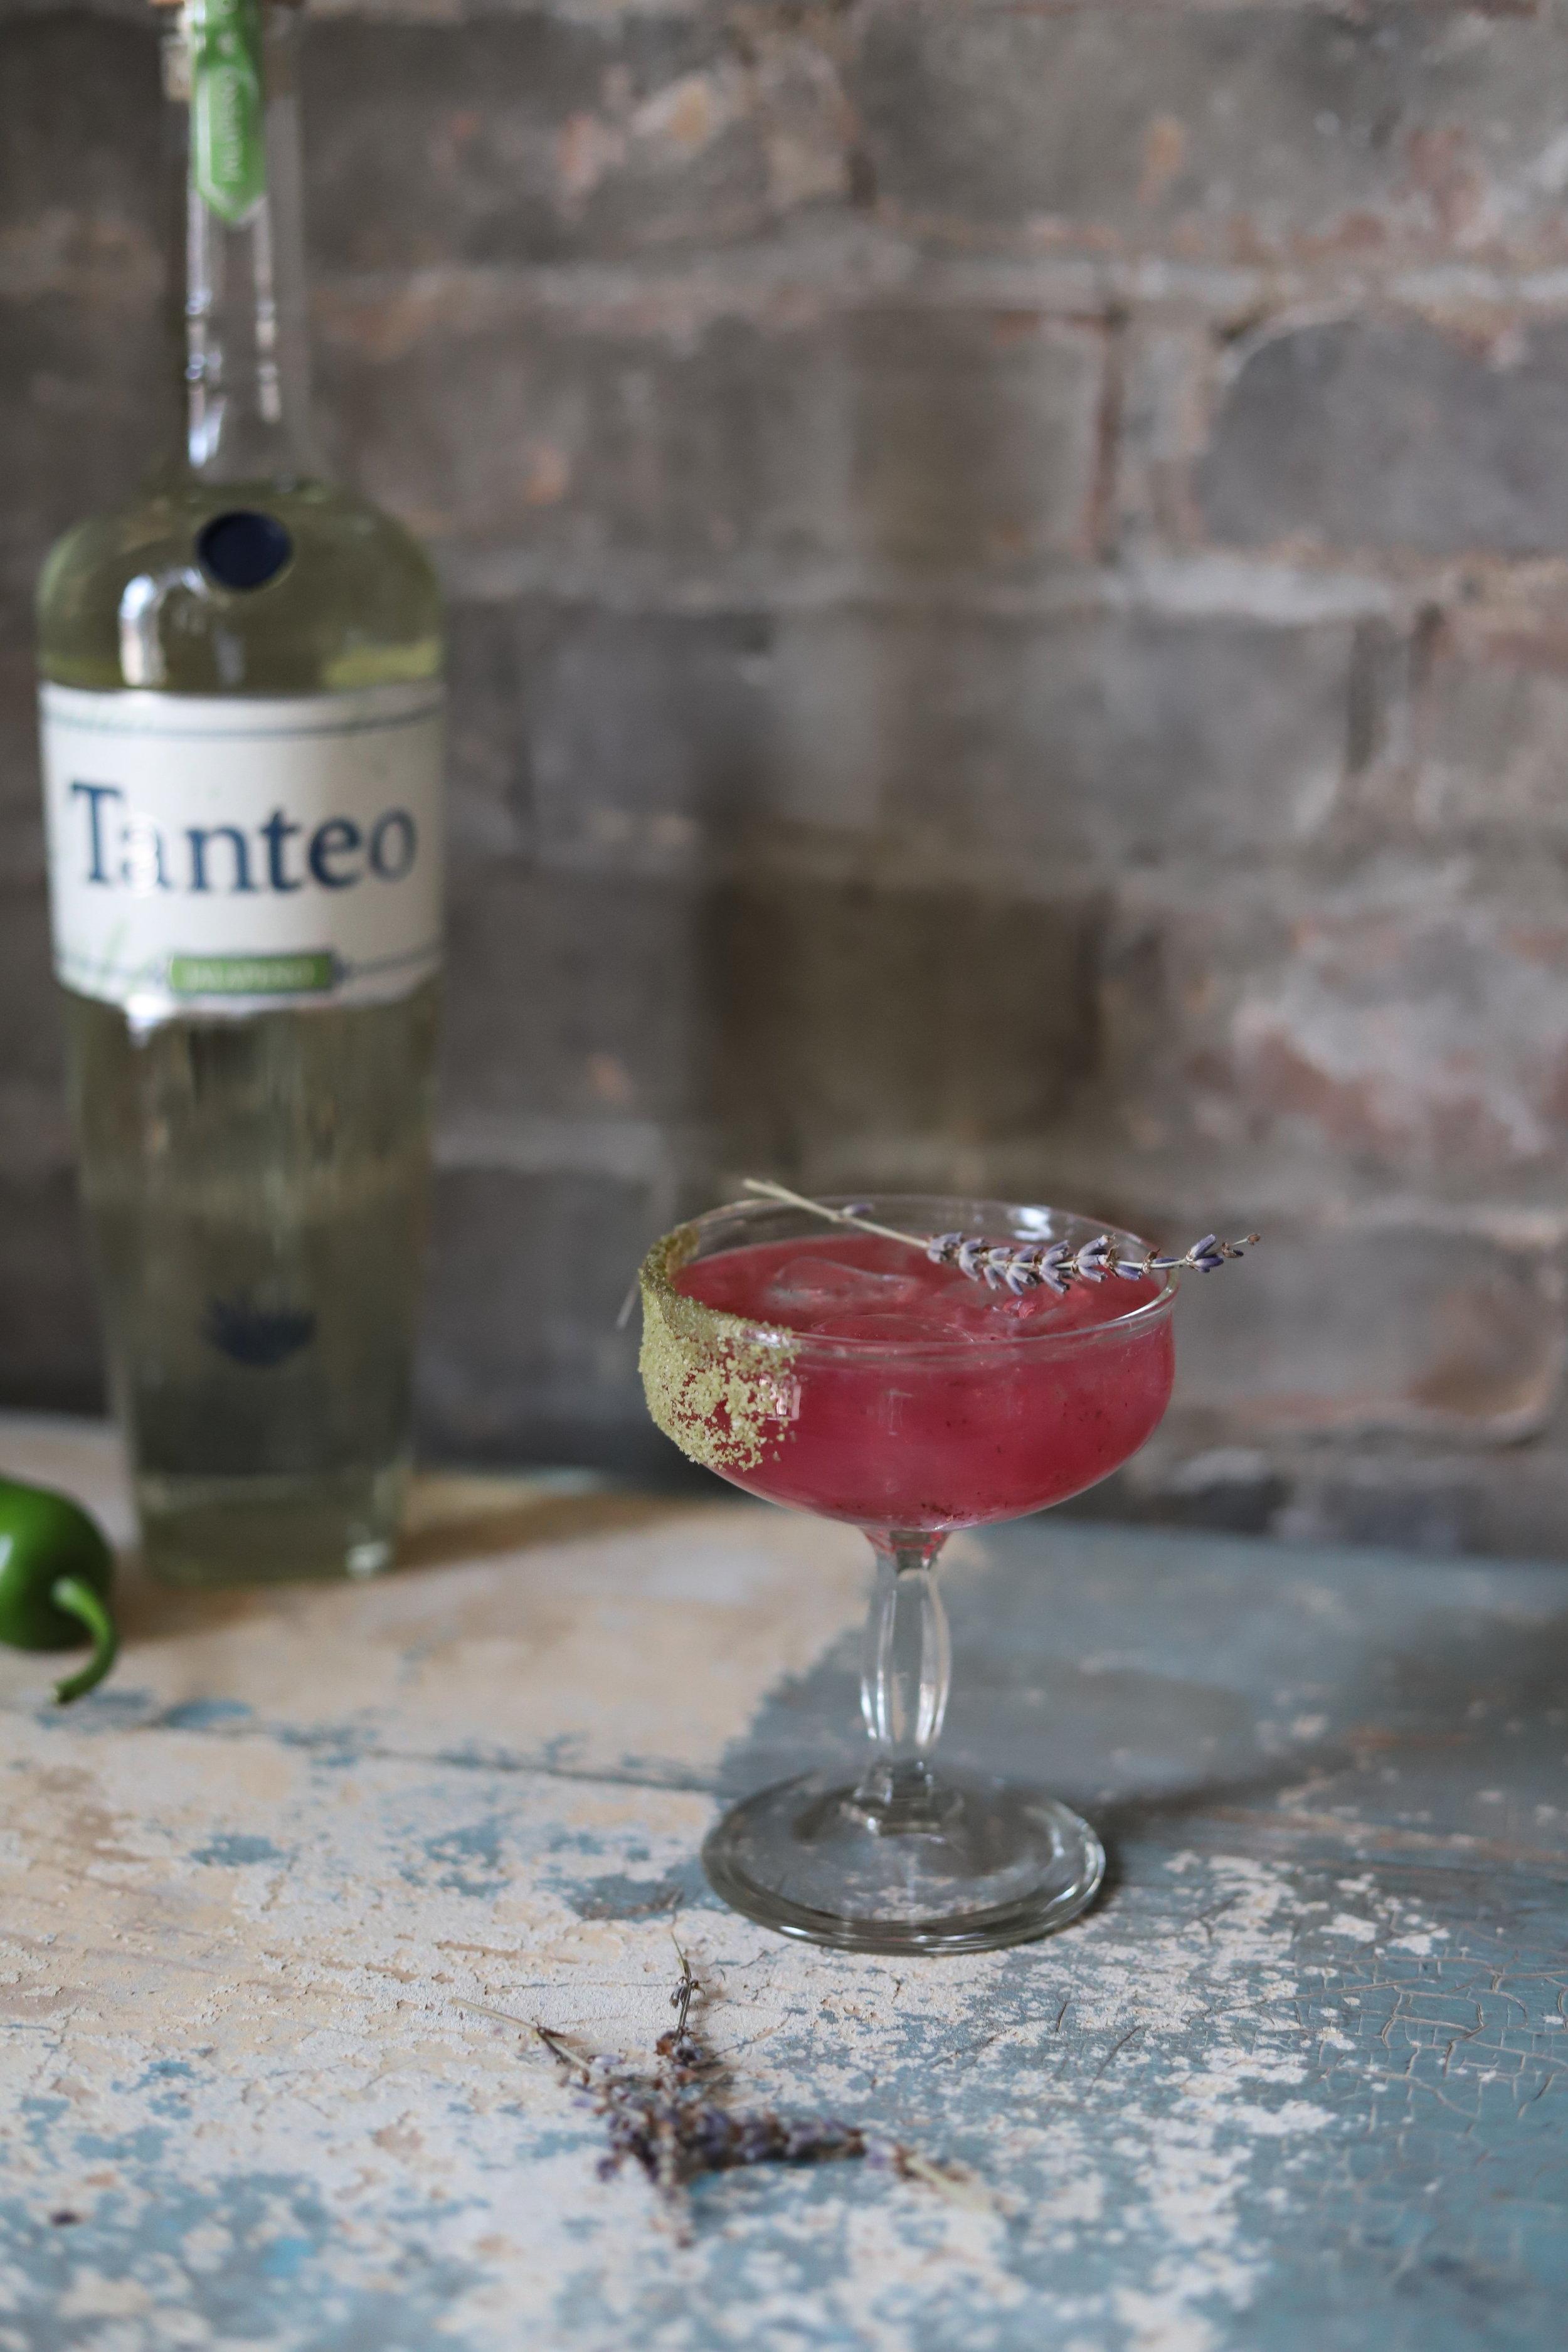 Recipe :  2 oz. Tanteo Jalapeño Tequila  1 oz. Lavender Syrup  ¾ o. Fresh Lime Juice